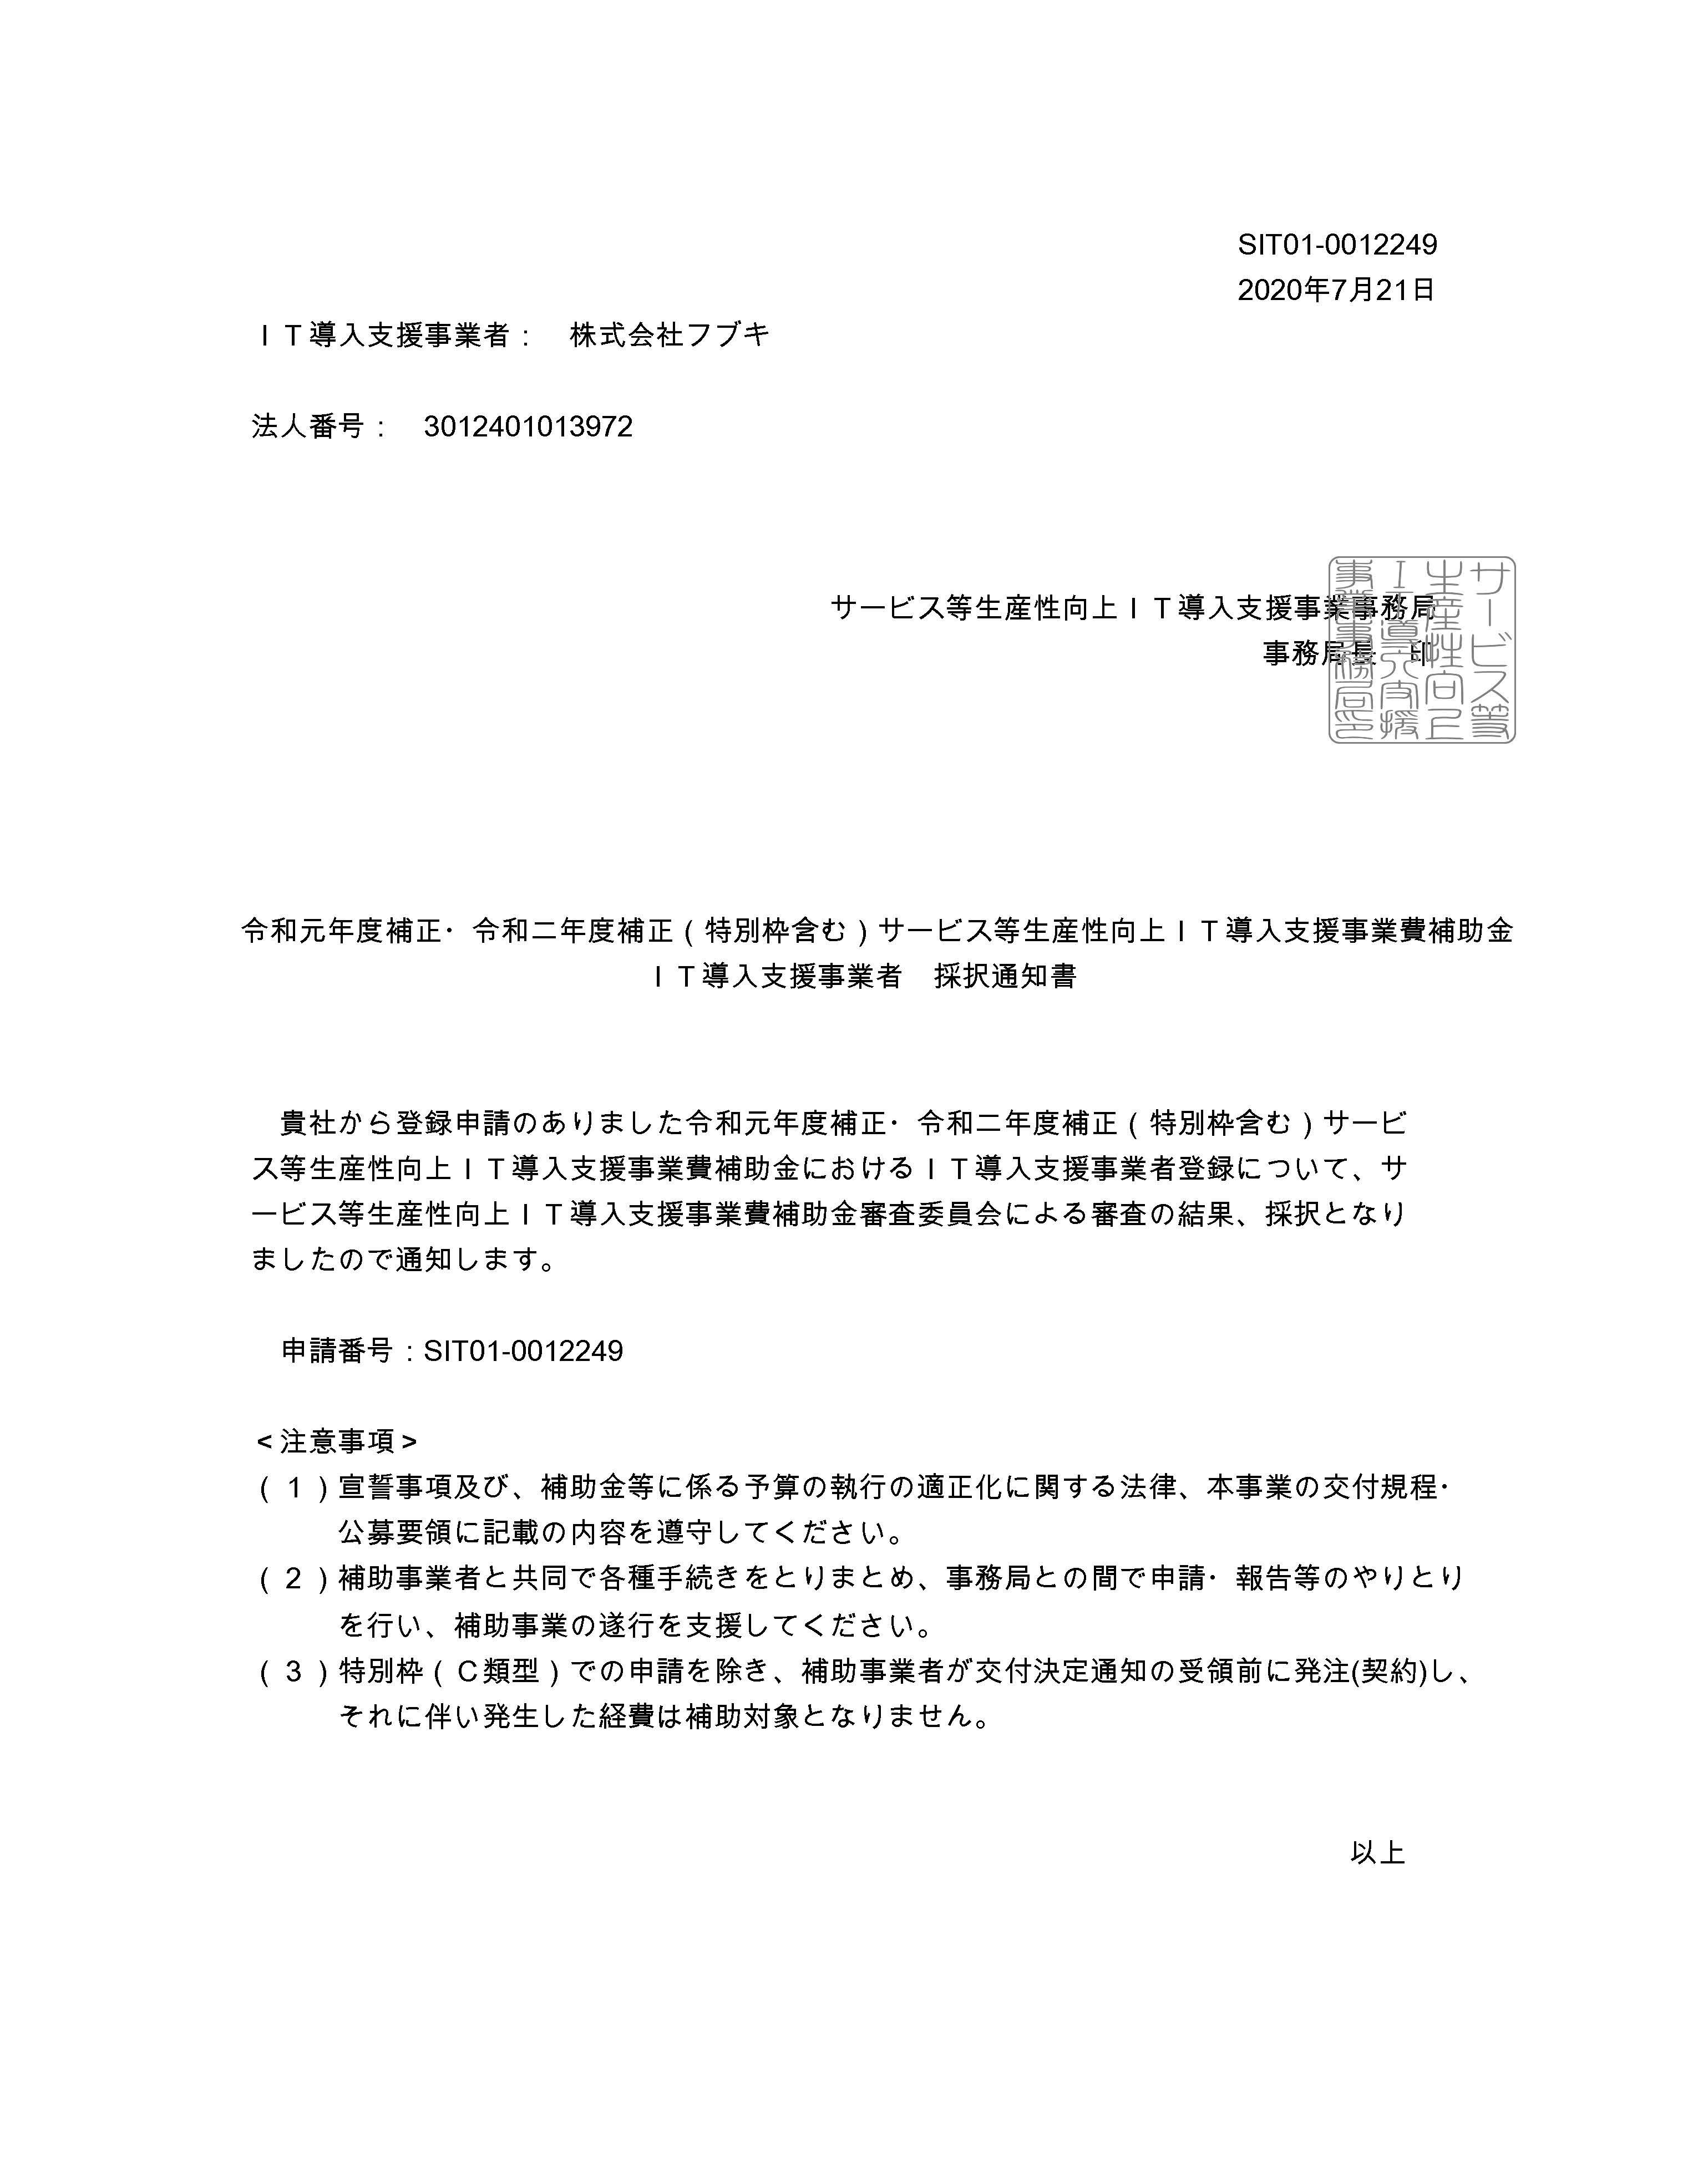 IT導入支援事業者採択通知書SIT01-0012249-1